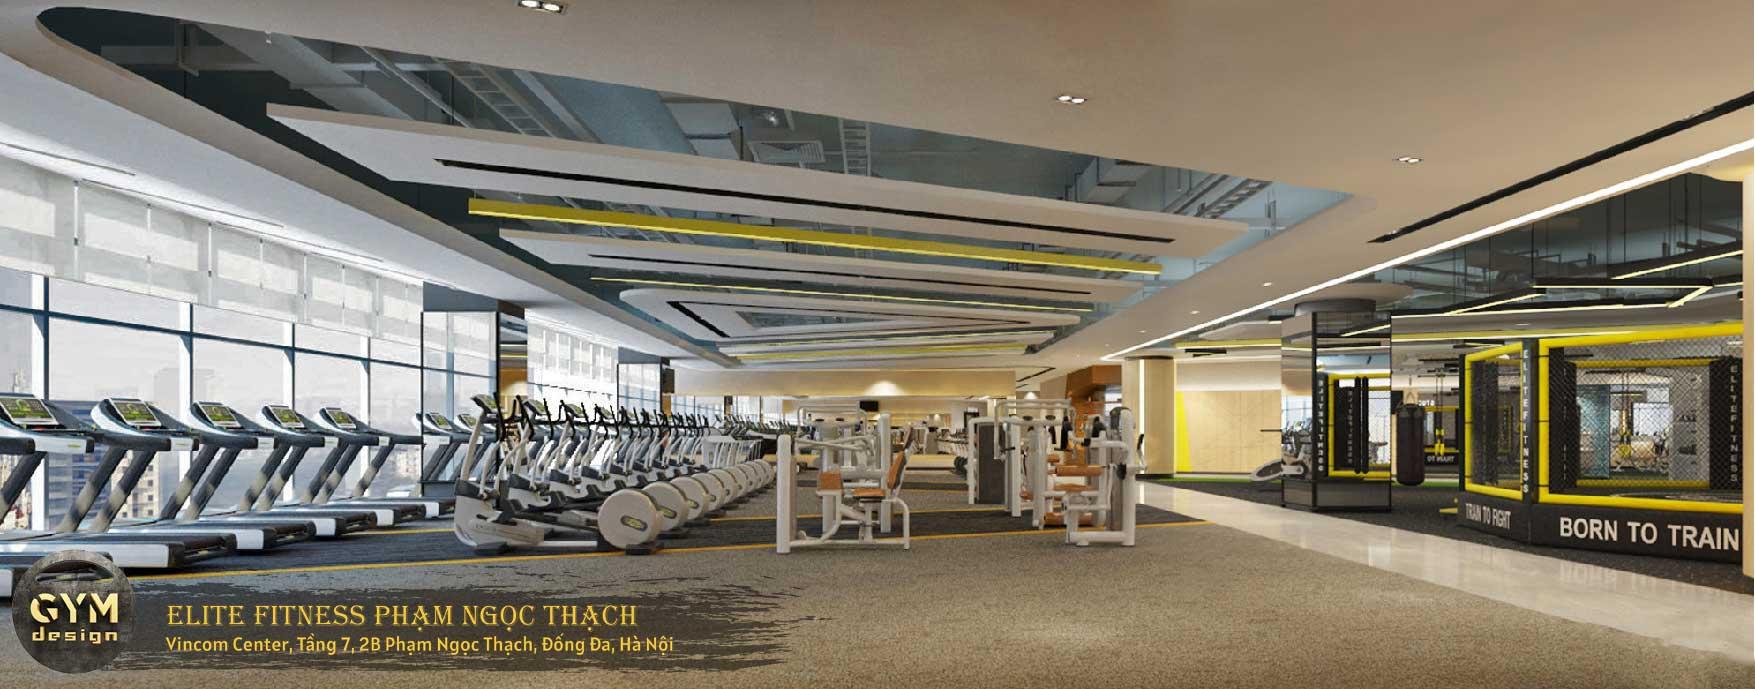 du-an-elite-fitness-pham-ngoc-thach-1